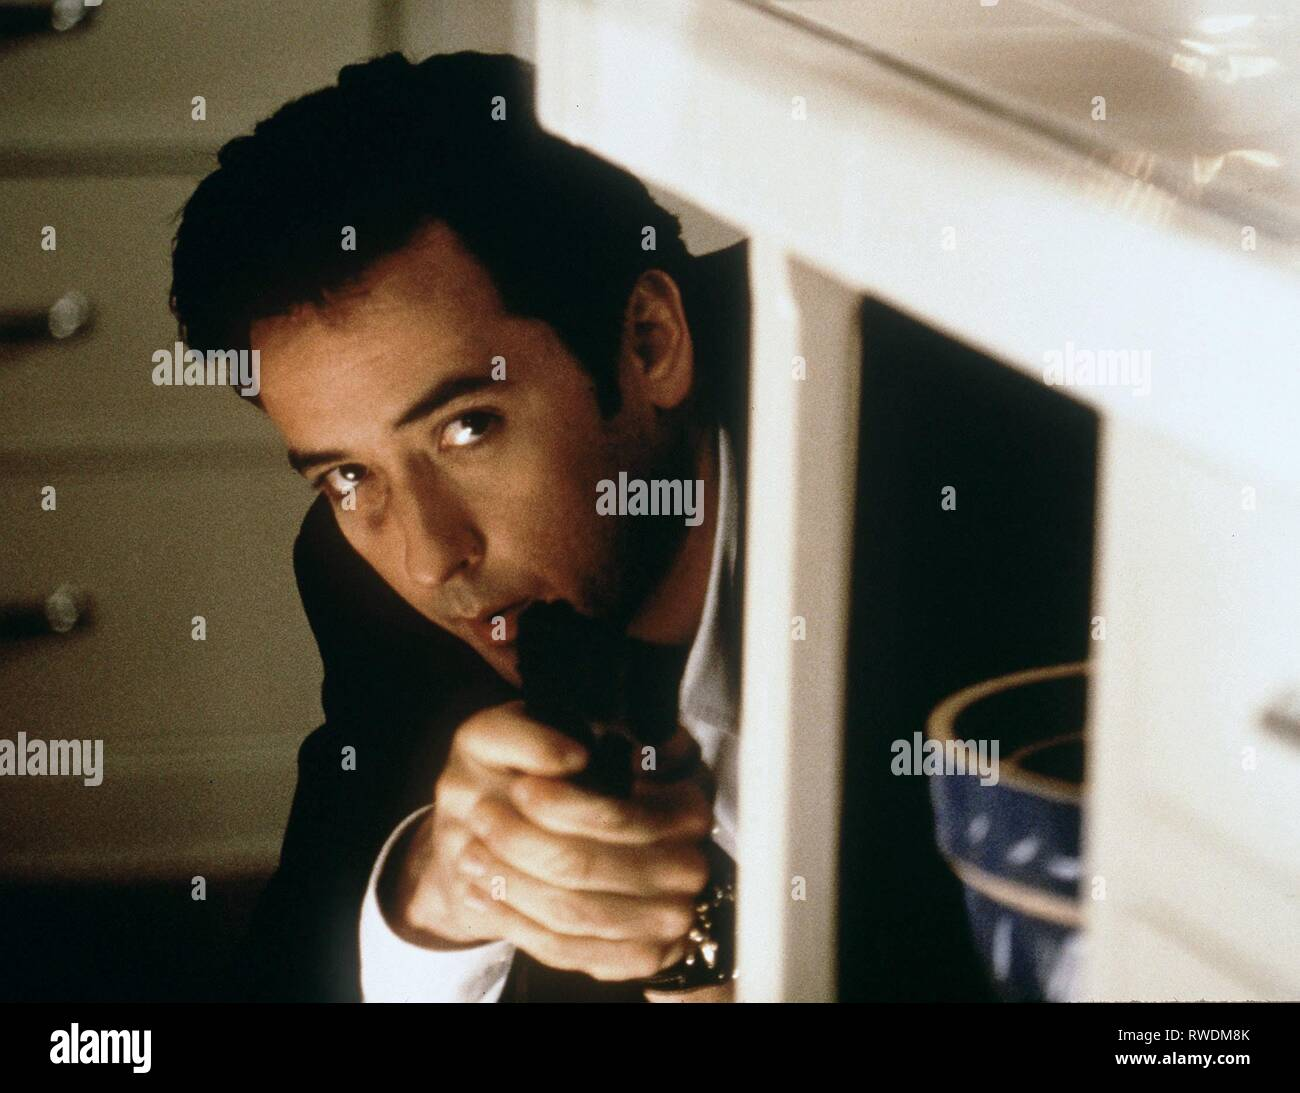 JOHN CUSACK, GROSSE POINTE BLANK, 1997 - Stock Image